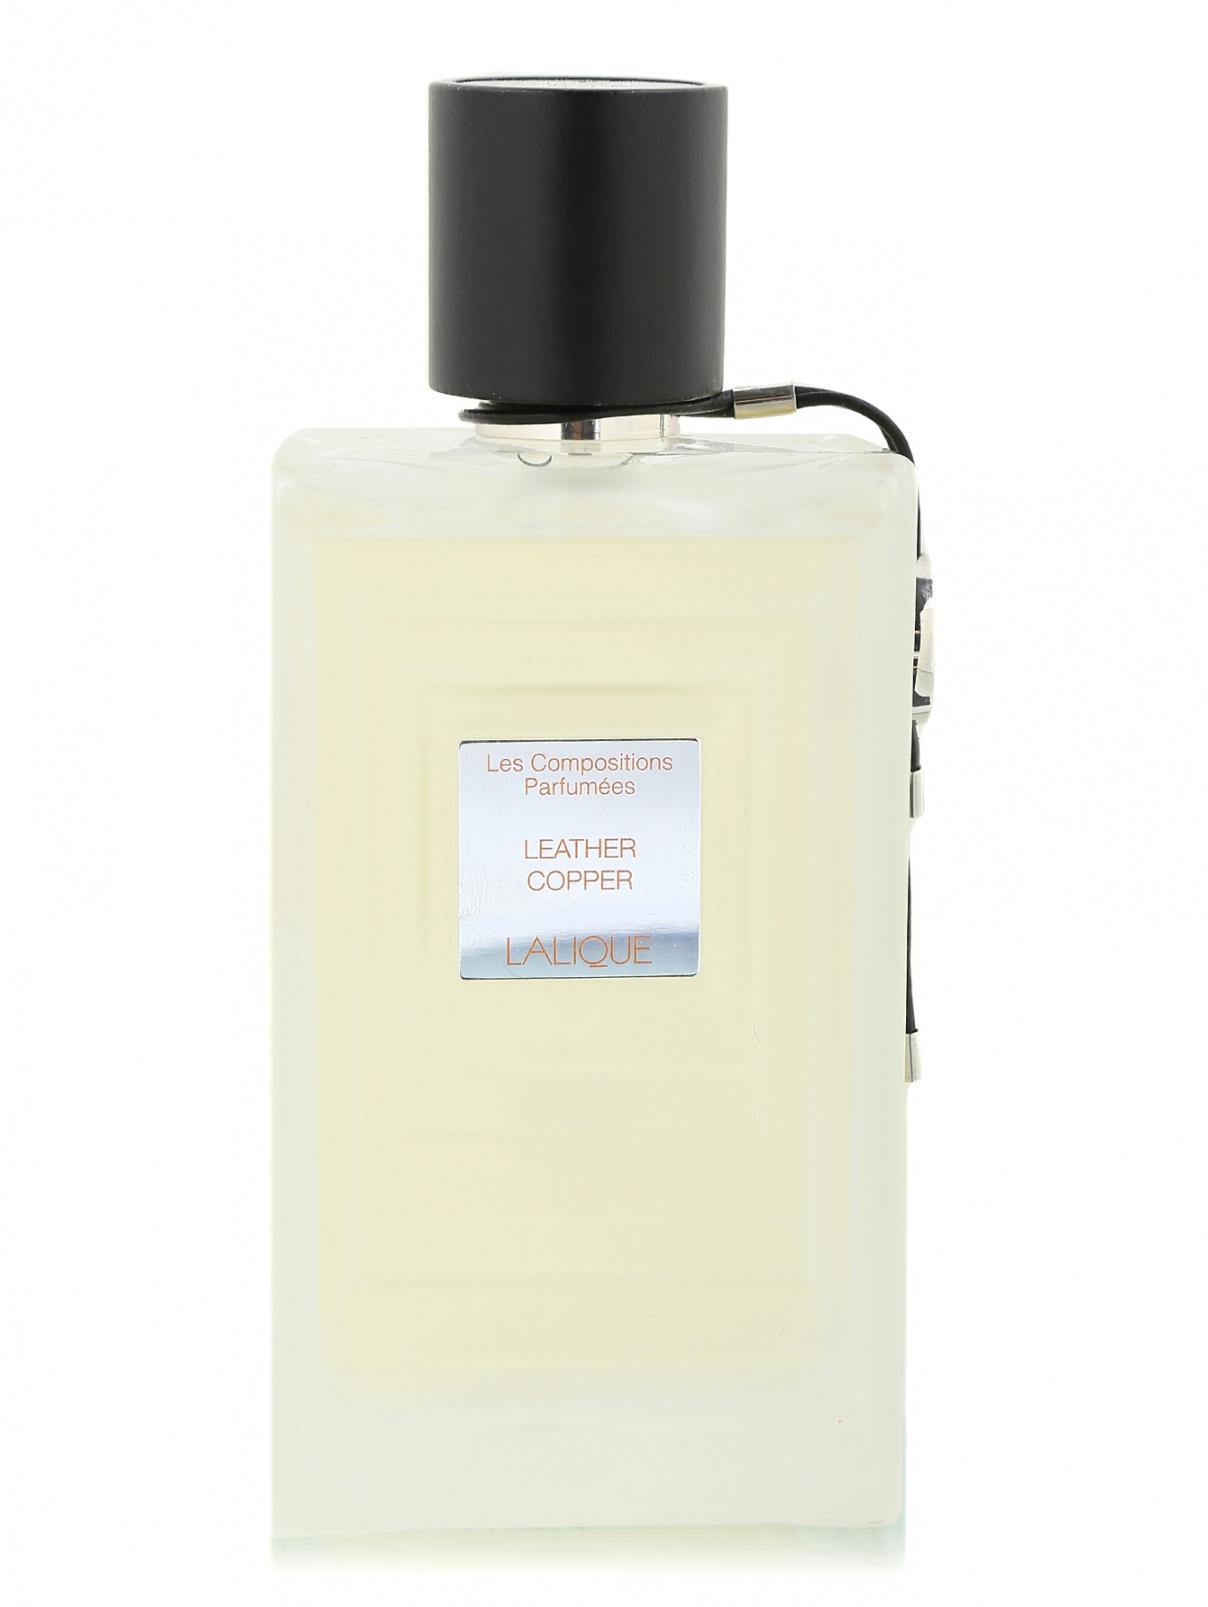 Парфюмерная вода 100 мл Leather Cooper Lalique  –  Общий вид